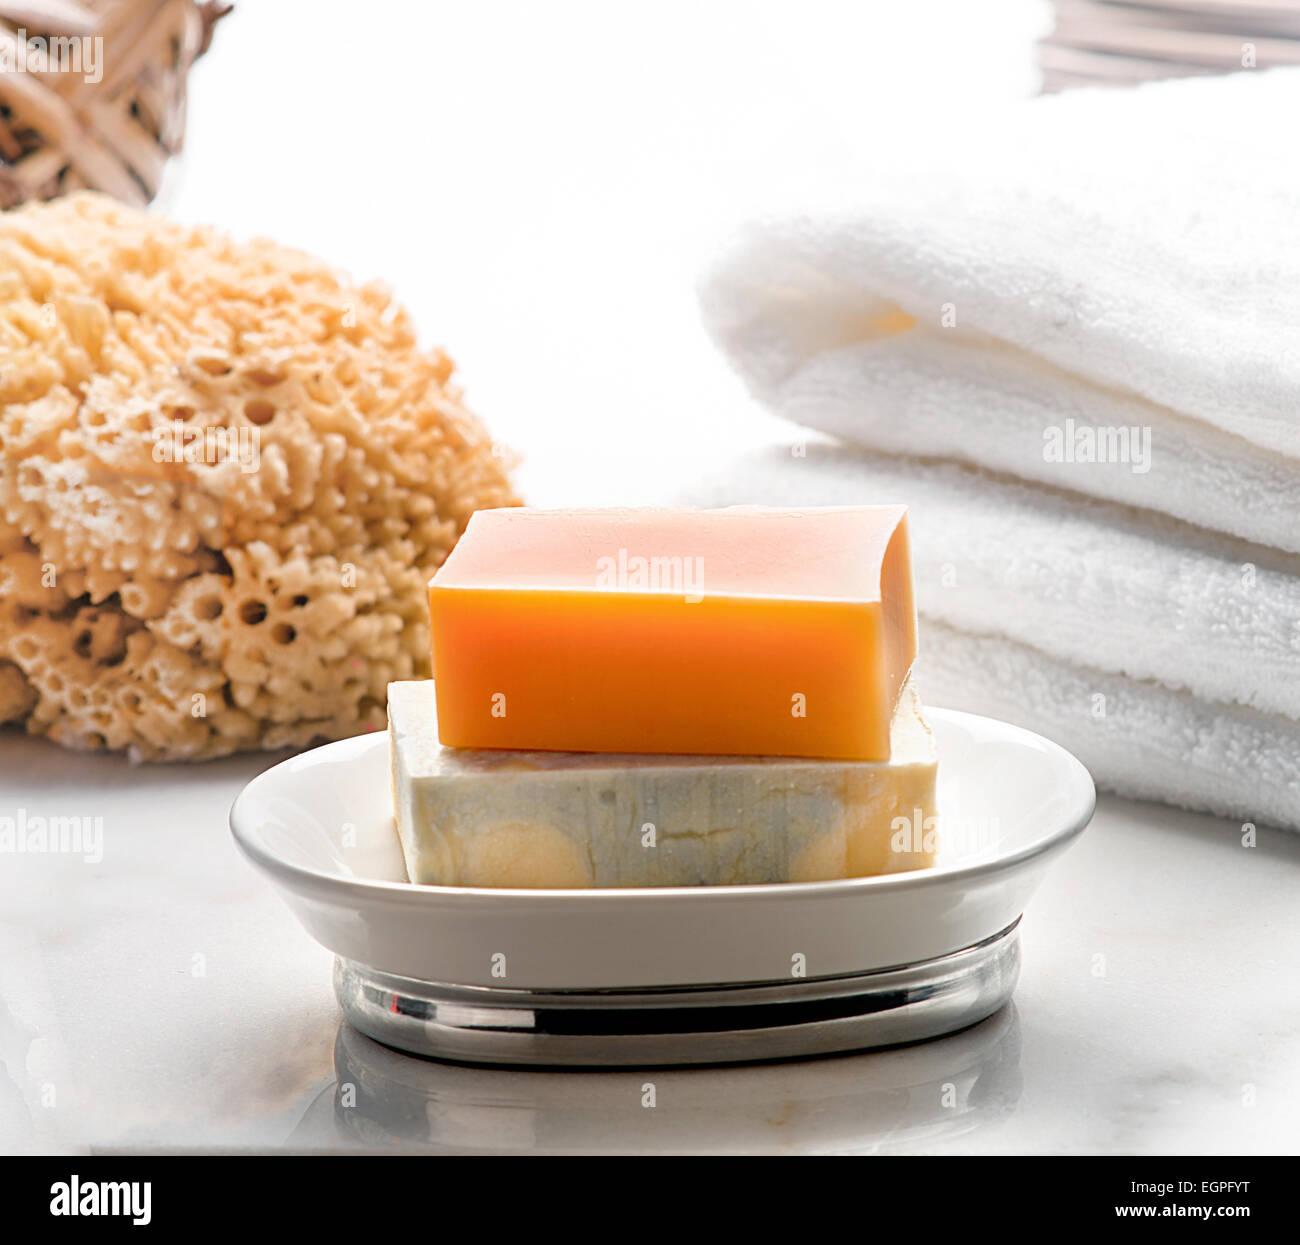 soap bathroom - Stock Image